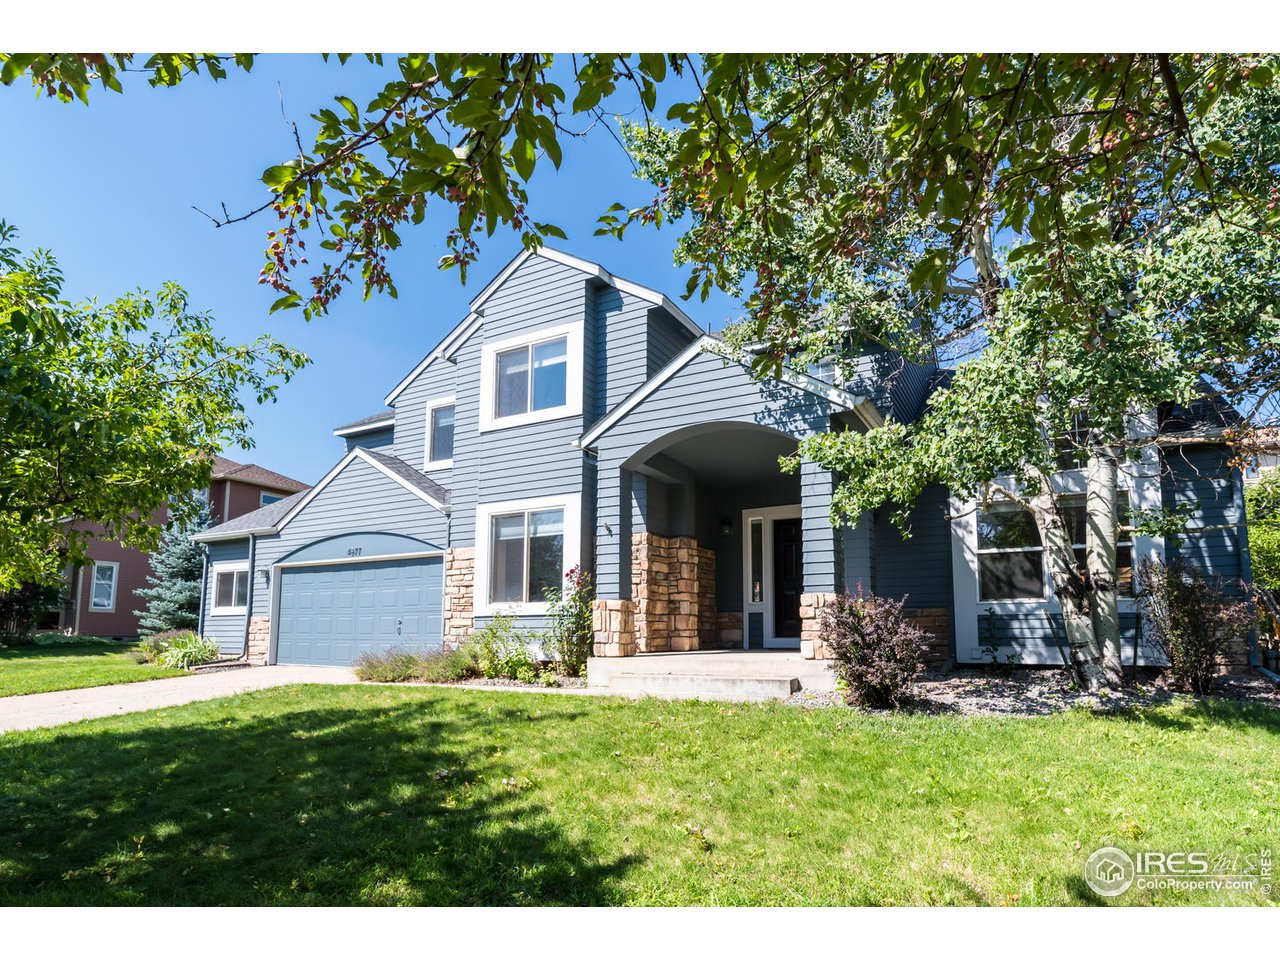 4877 Fountain St, Boulder CO 80304